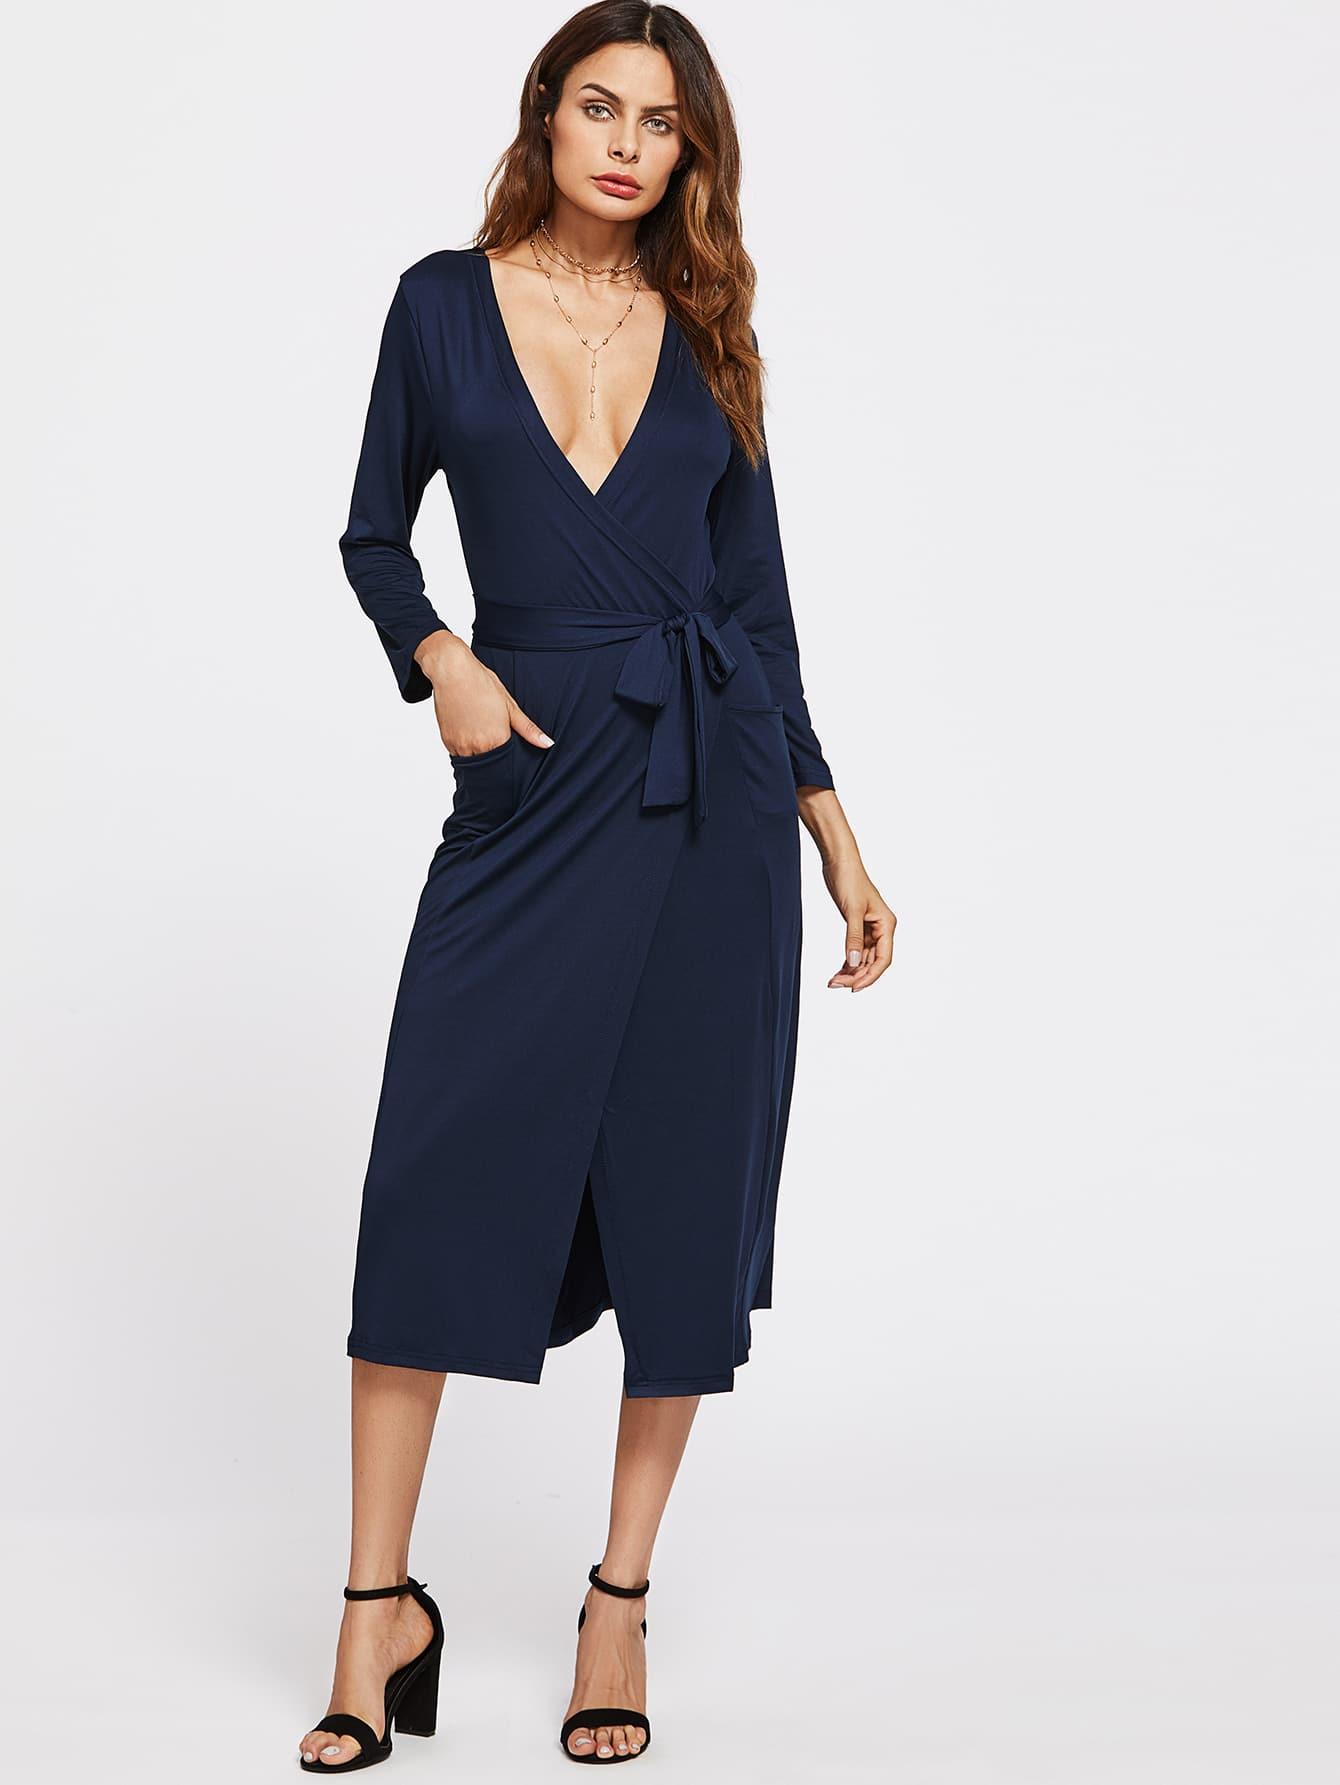 Deep V Neckline Surplice Front Dress dress170714332